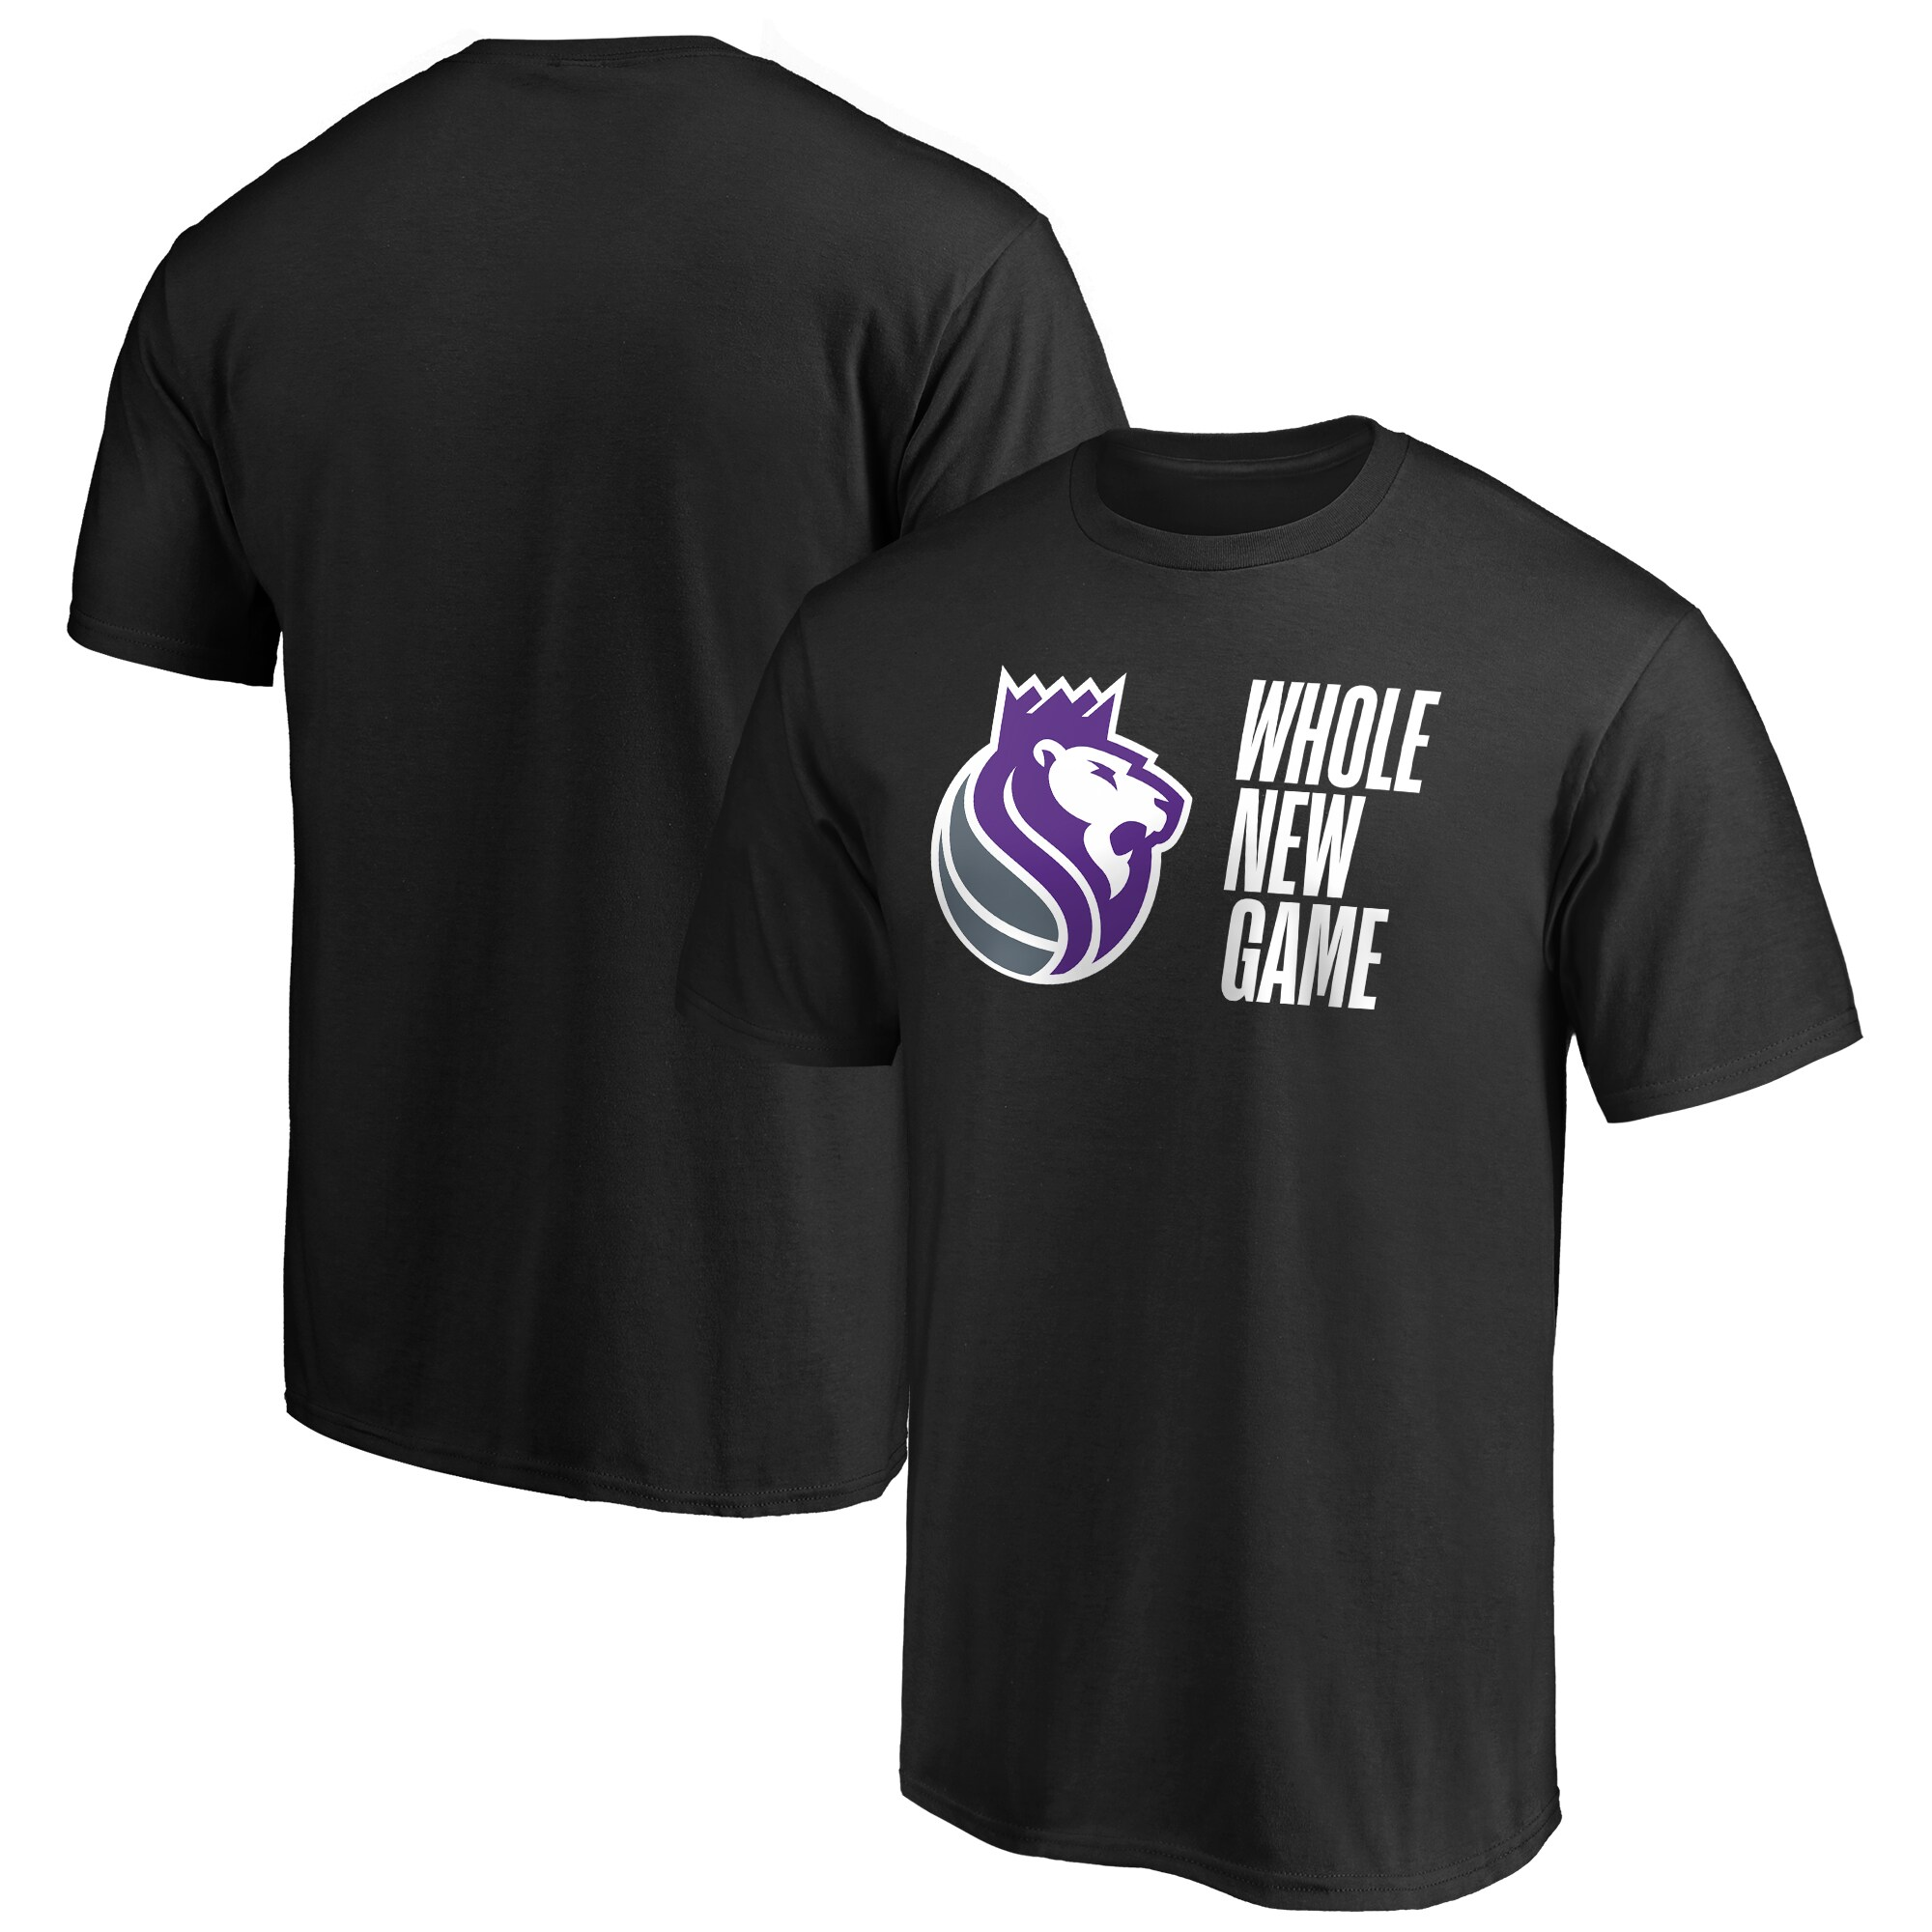 Sacramento Kings Fanatics Branded Whole New Game Team T-Shirt - Black